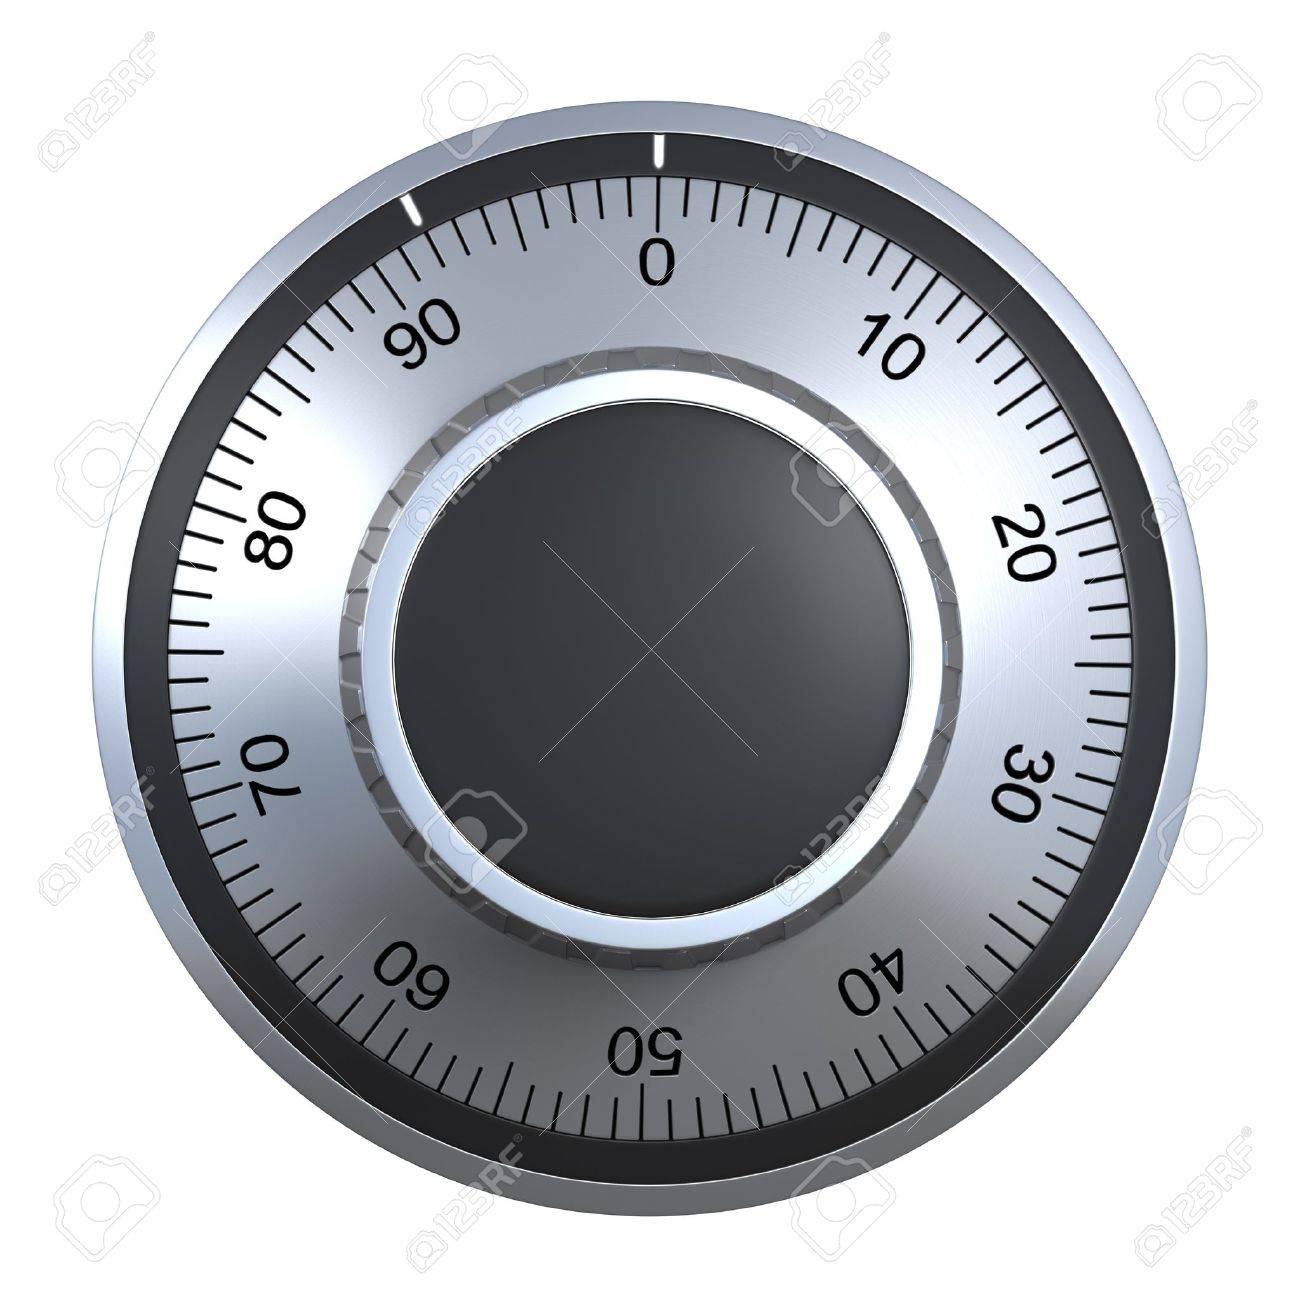 combination lock (isolated) Stock Photo - 9549027